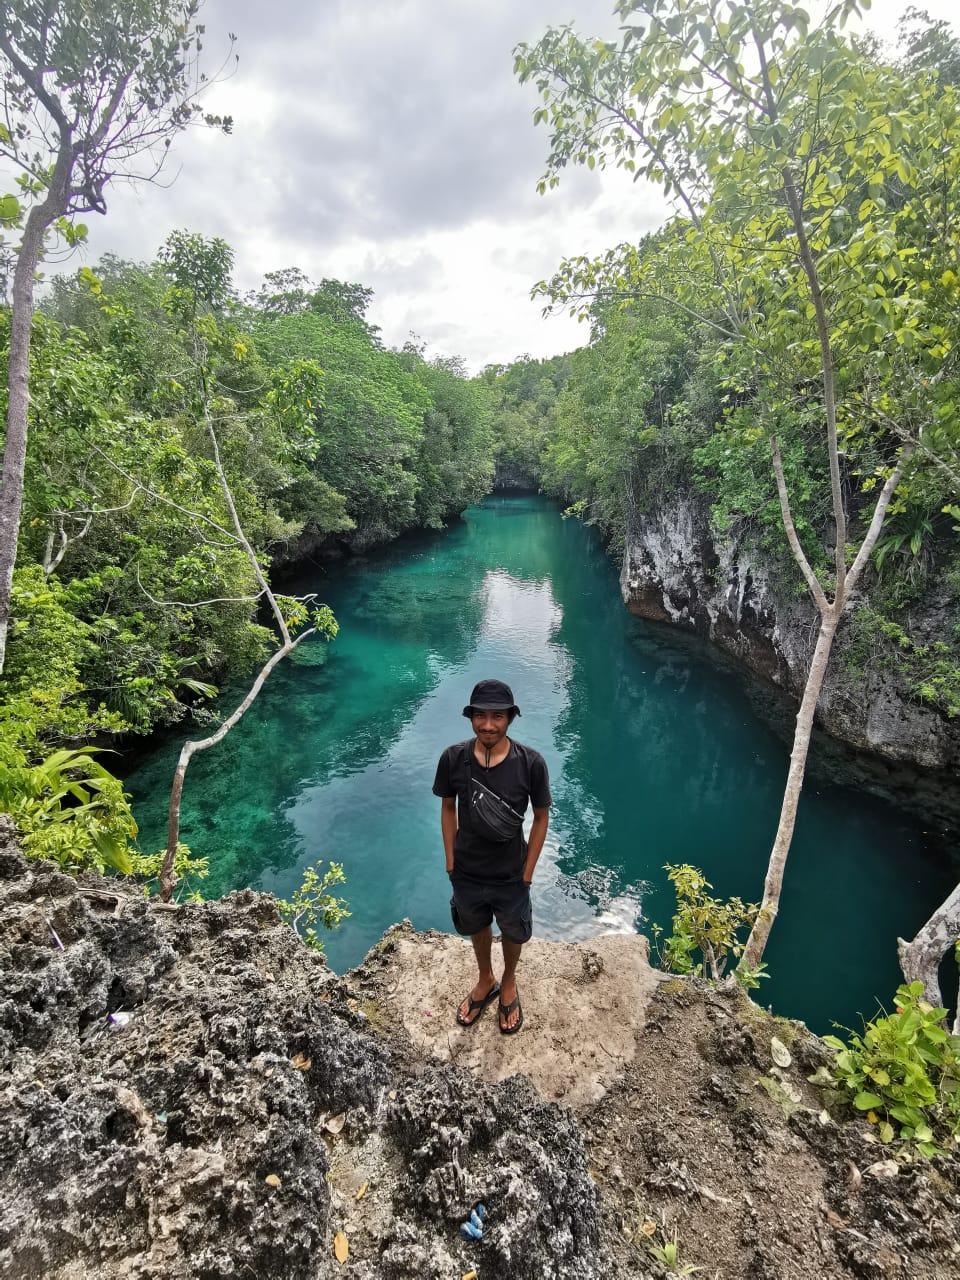 Wisata Danau Sole di Pulau Manawoku, Desa Amarsekaru, Kecamatan Pulau Gorom, Kabupaten Seram Bagian Timur